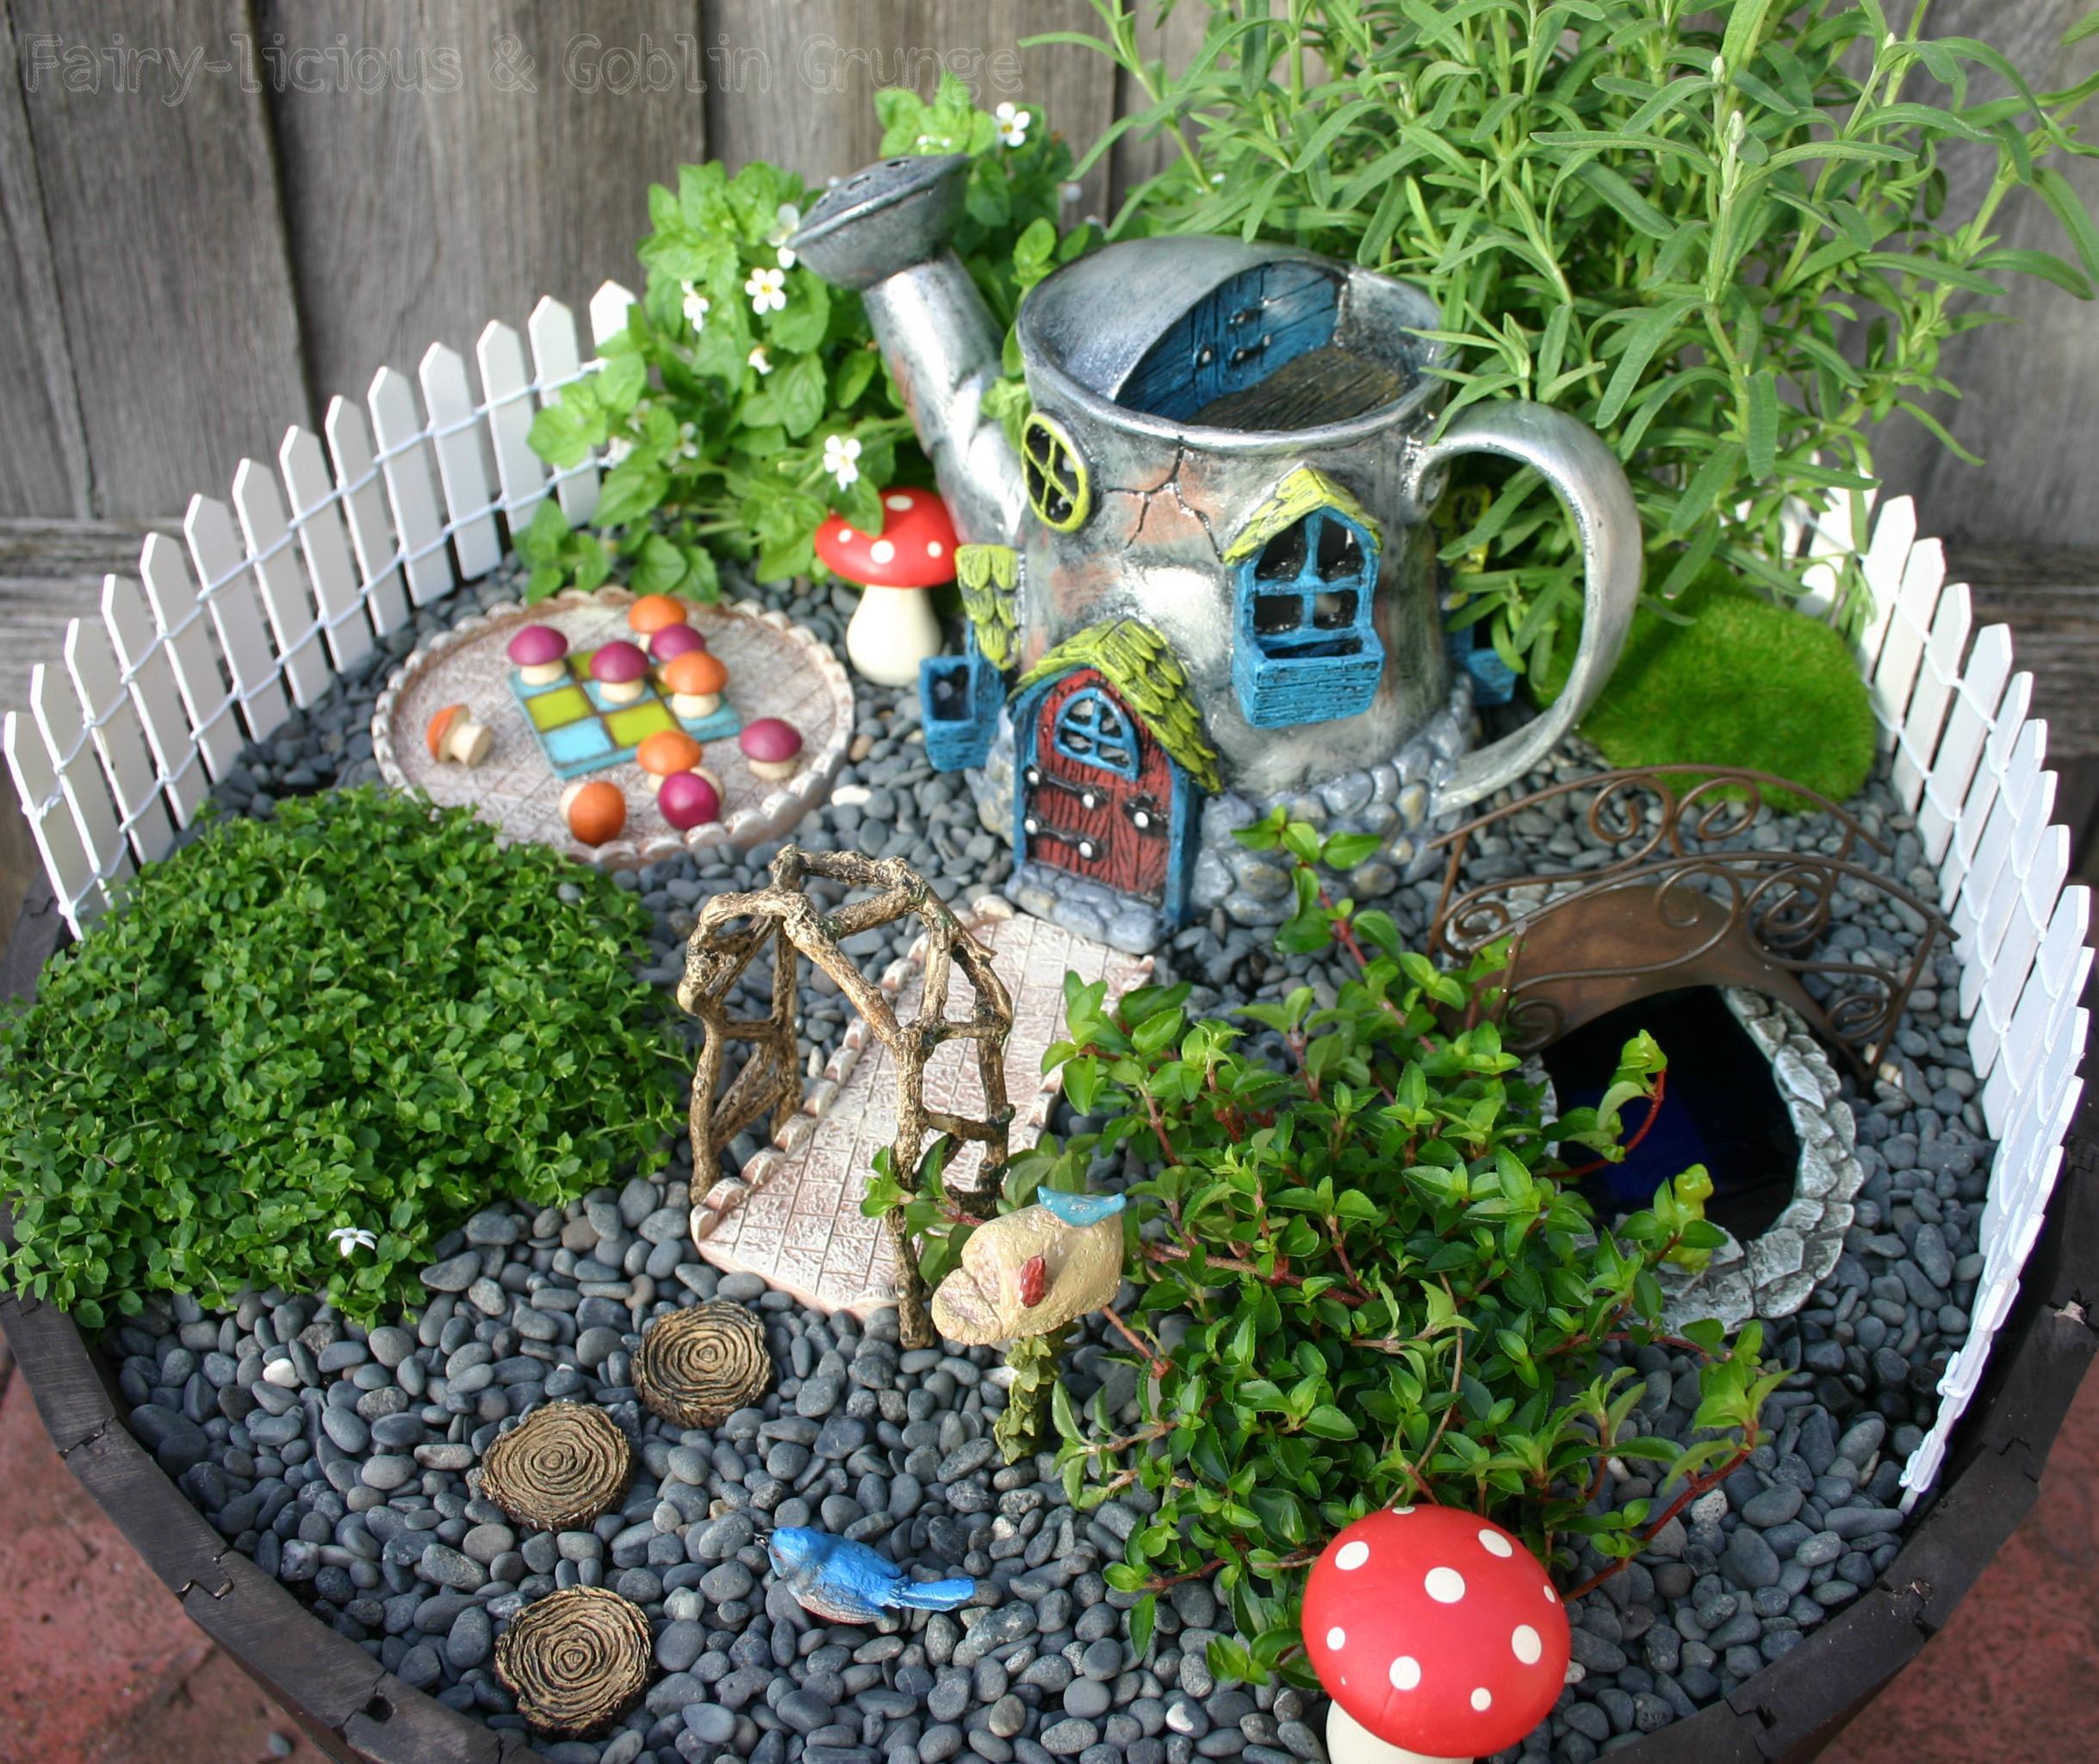 Smothery Fairy Garden Ideas Live Diy Ideas Inexpensive Garden Fairies garden Cheap Garden Fairies